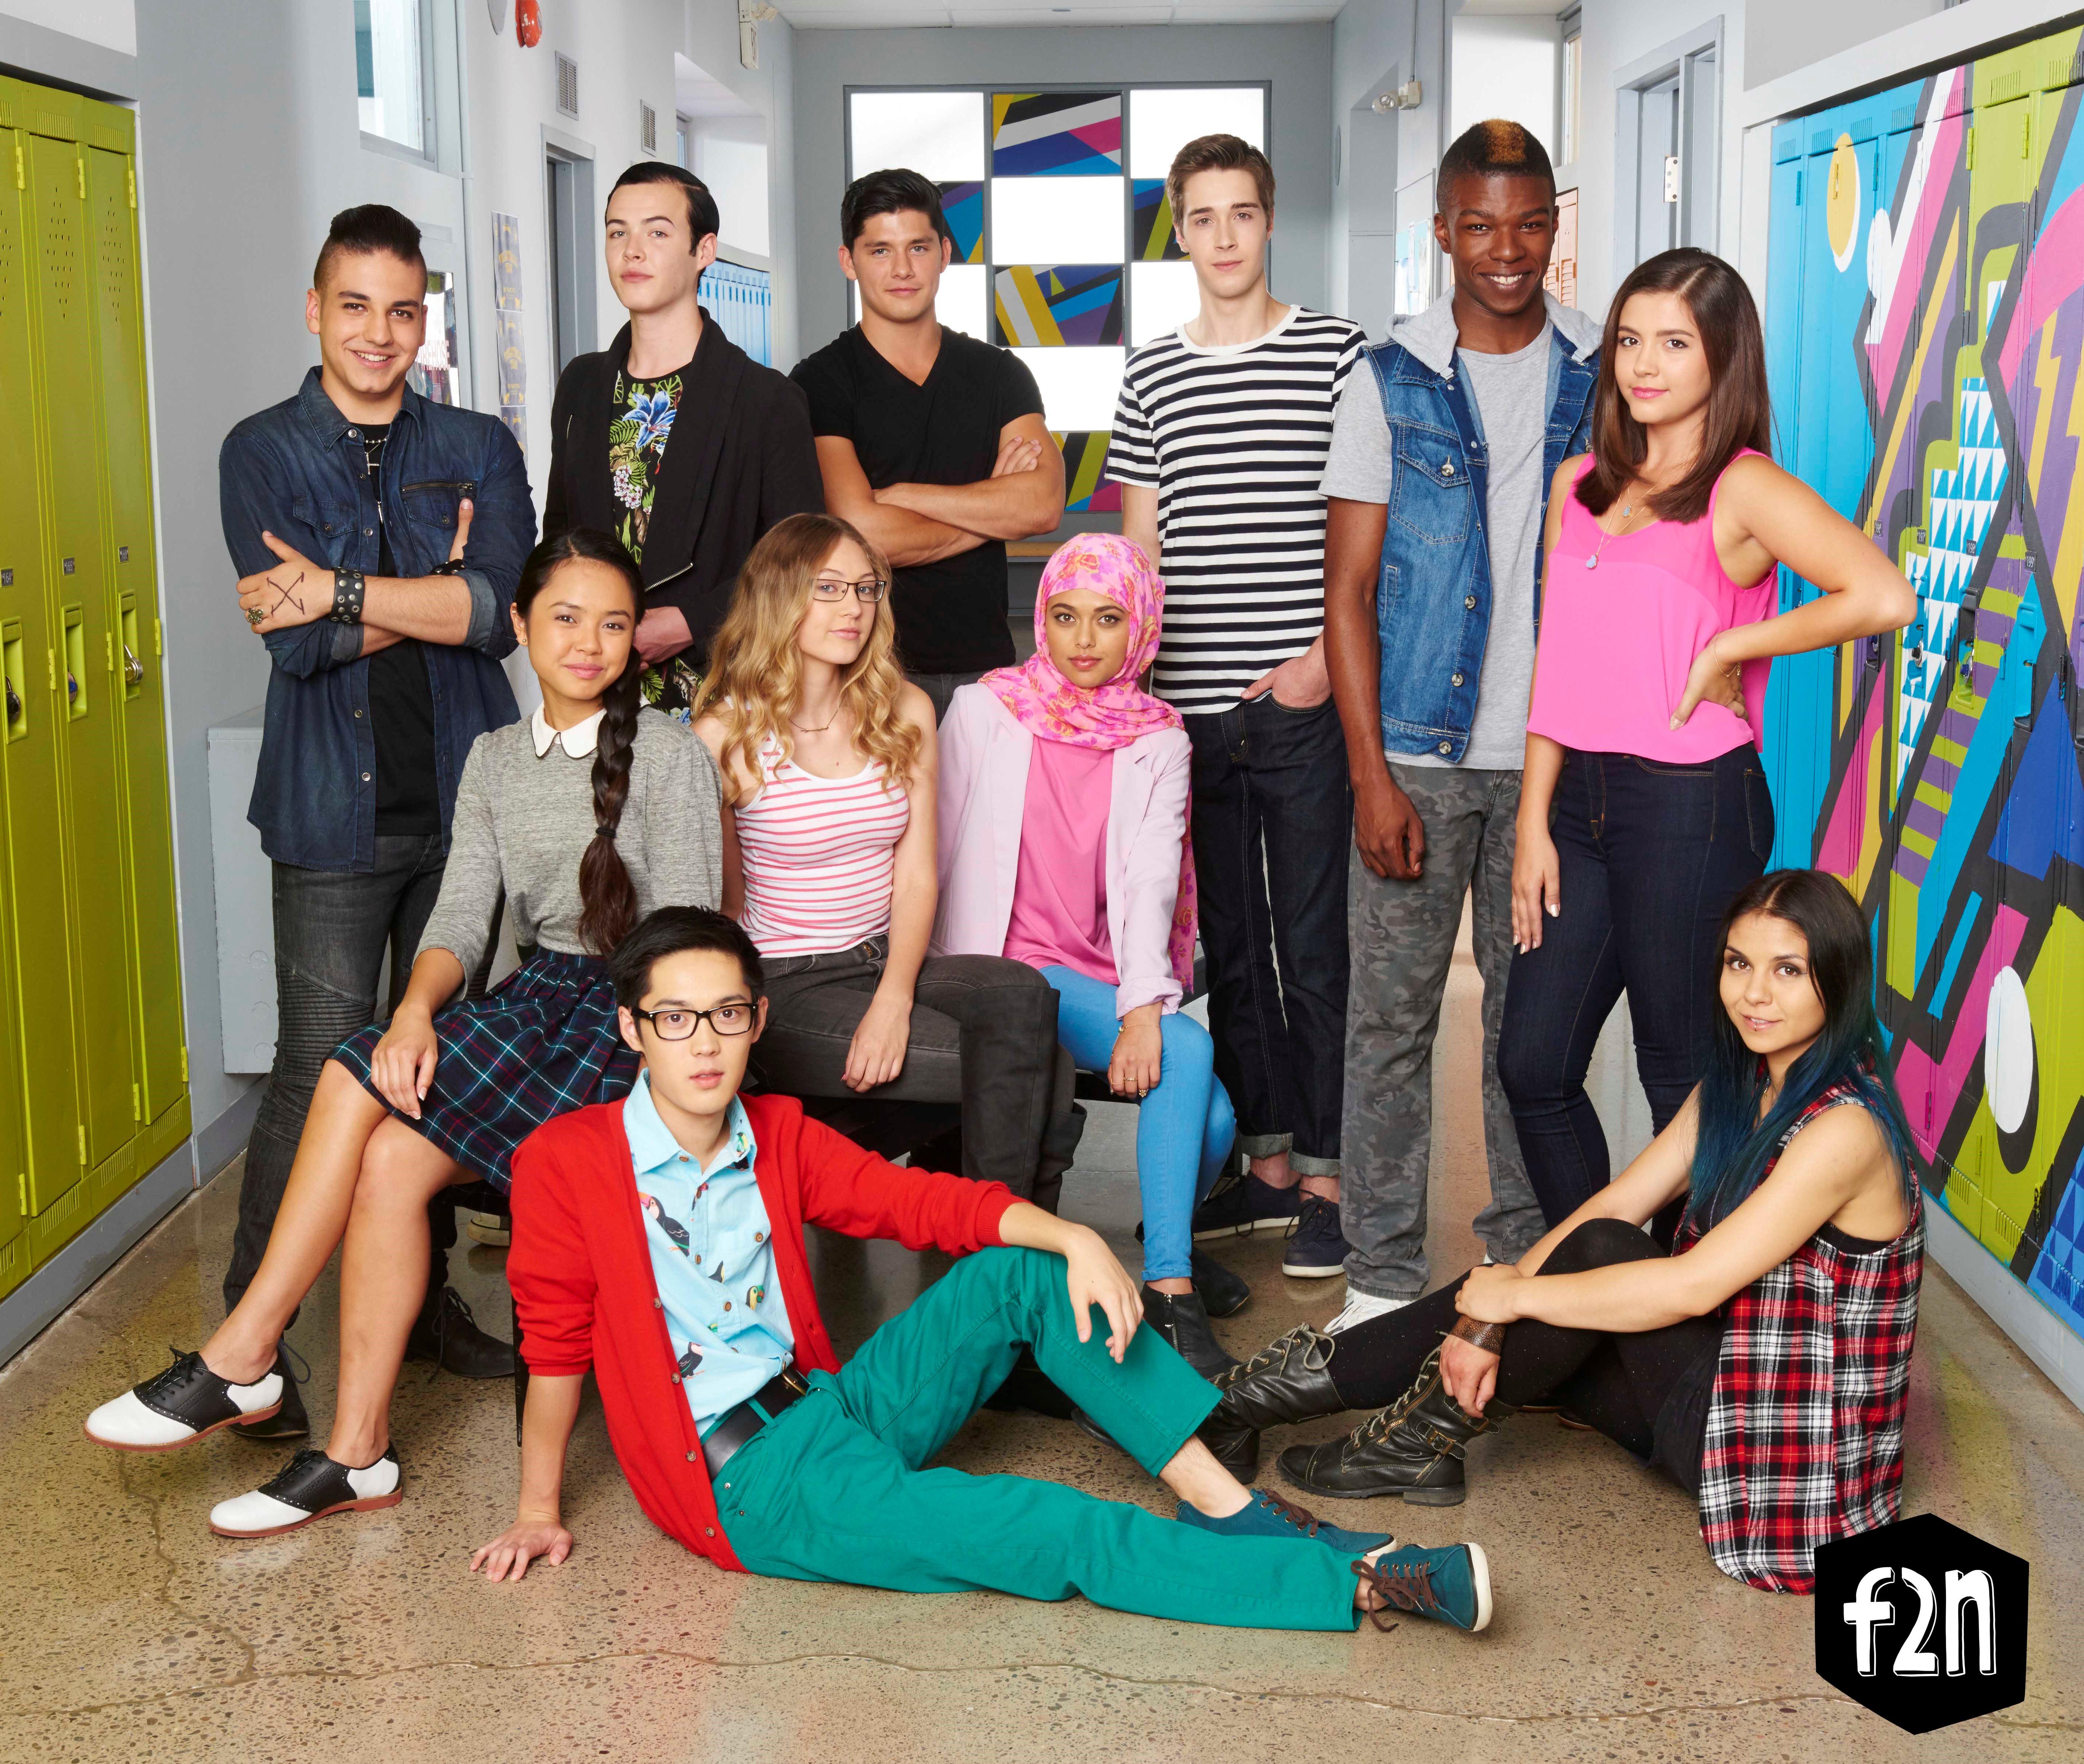 Degrassi Next Class Season 2 Degrassi Wiki Fandom